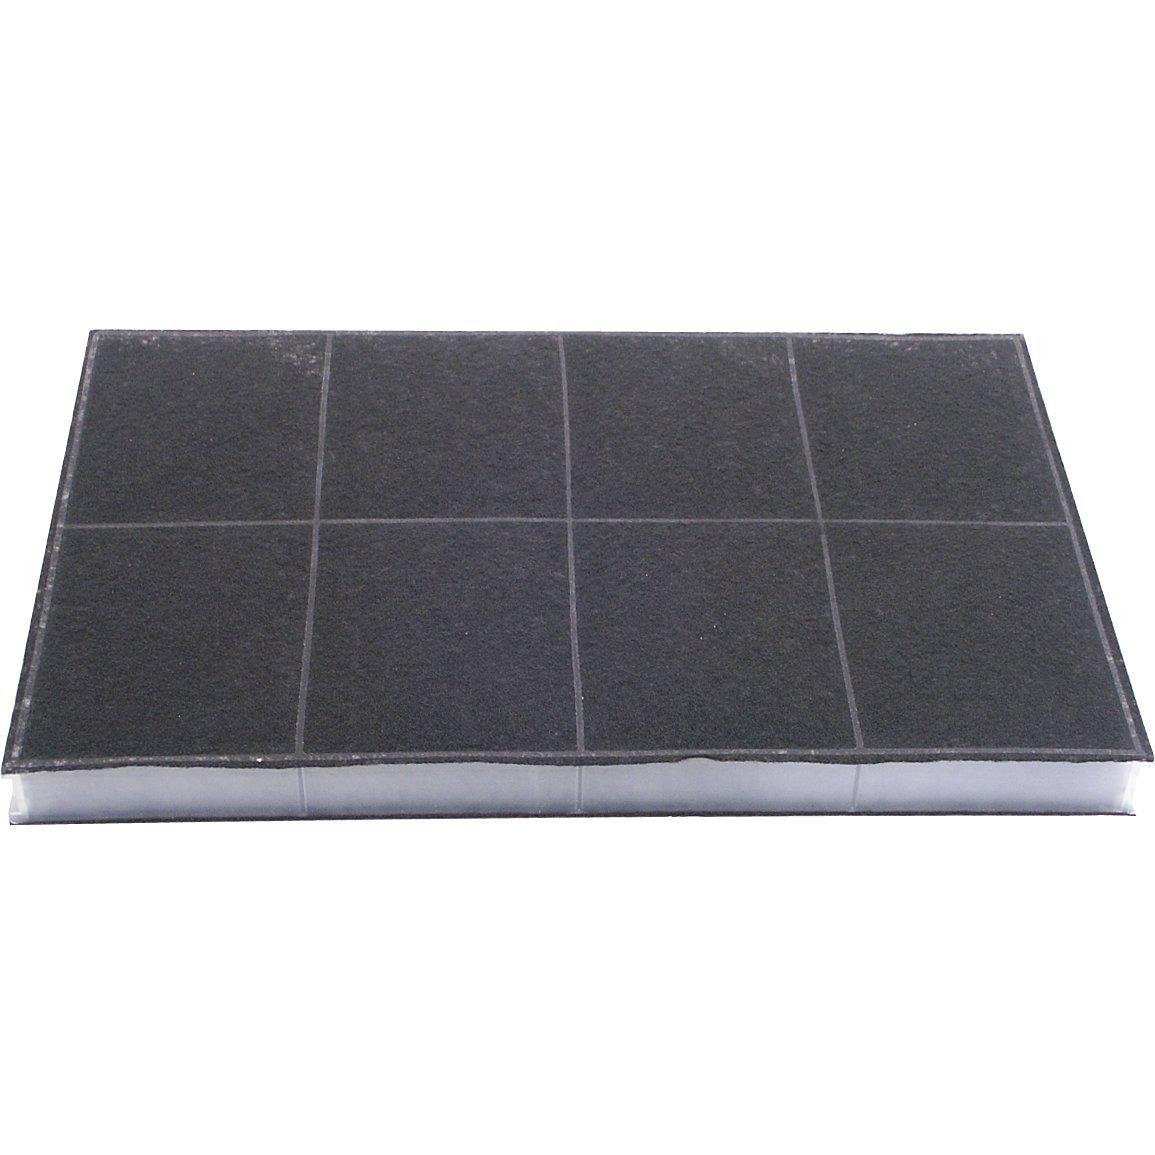 kohlefilter dunstabzugshaube jetzt g nstig kaufen. Black Bedroom Furniture Sets. Home Design Ideas